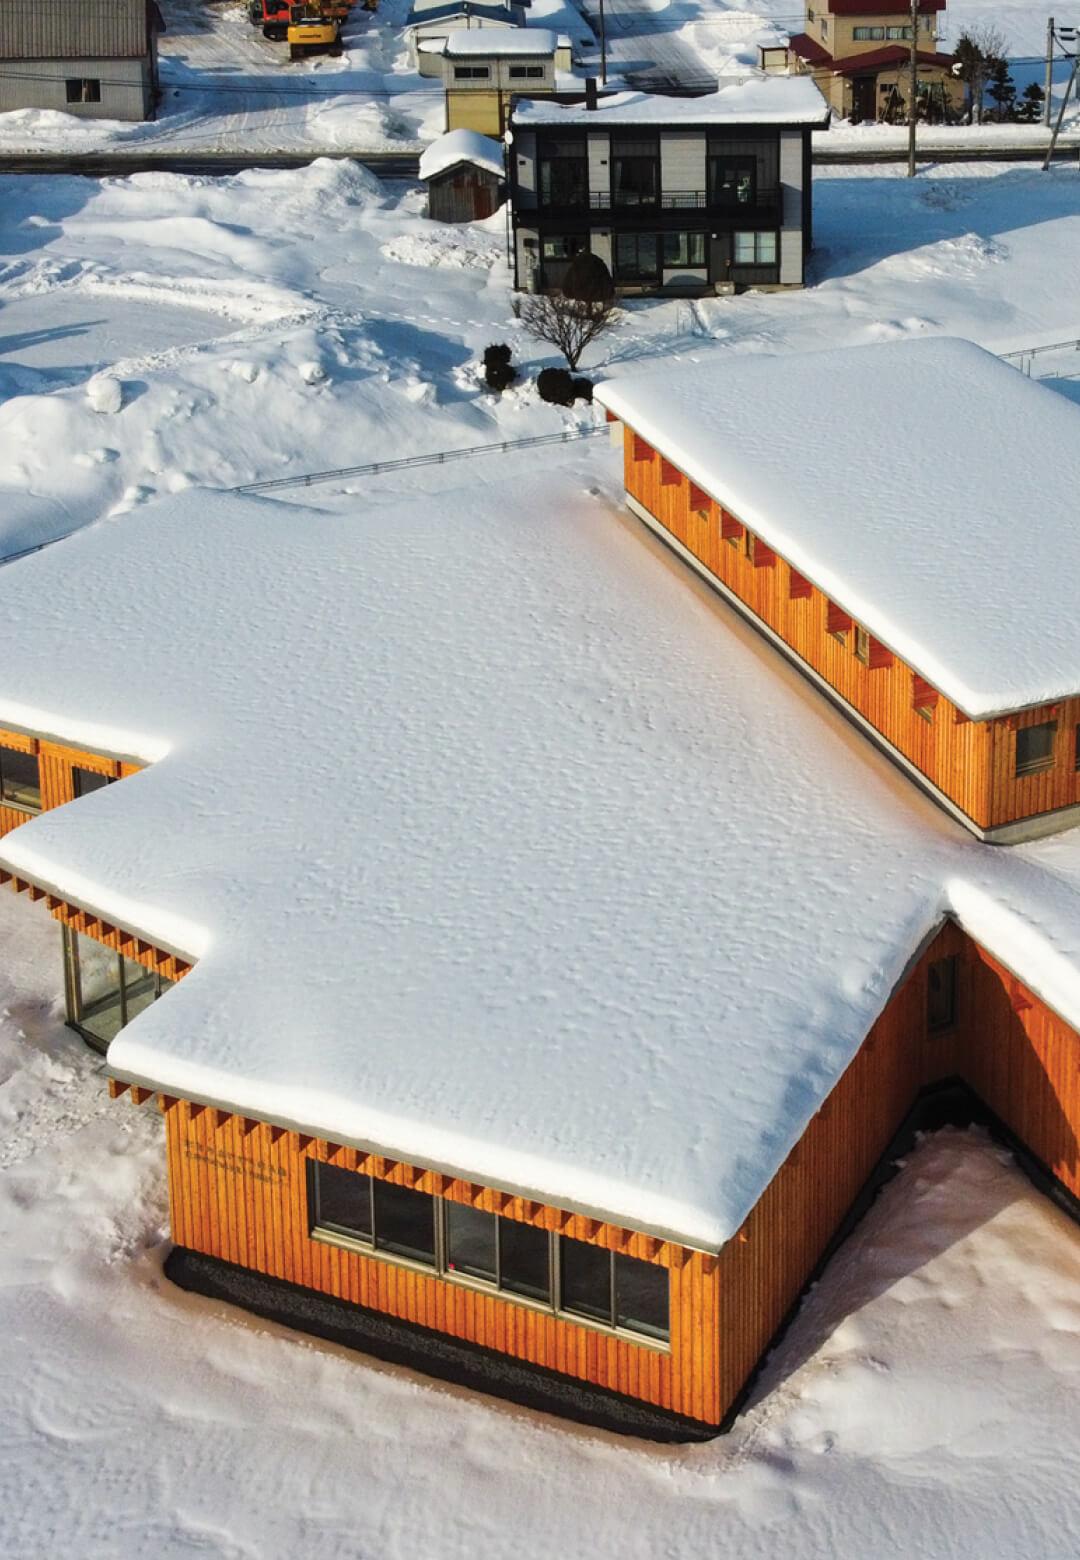 Yawara Nursery School in Hokkaido, Japan | Nursery School in Hokkaido by Kengo Kuma and Associates | STIRworld